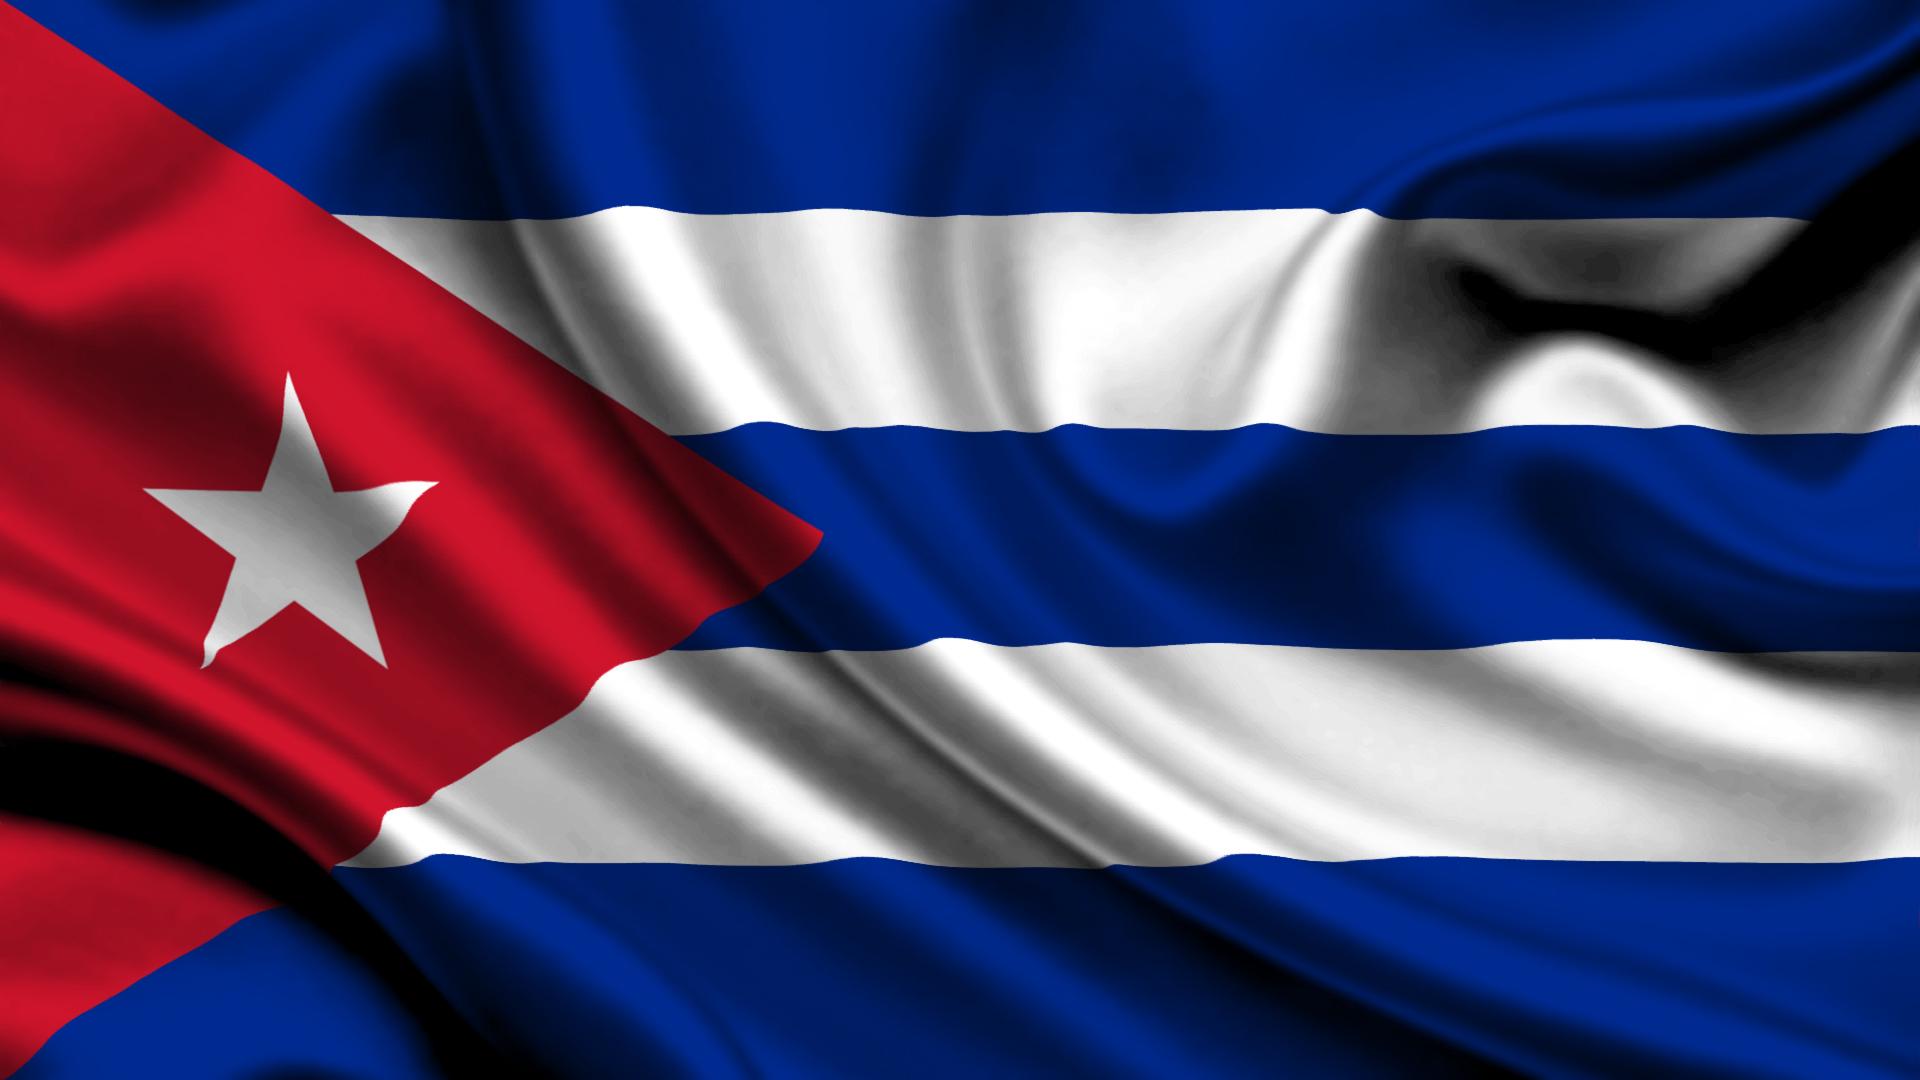 cuba flag cuba flag cuba flag cuba flag cuba flag 1920x1080